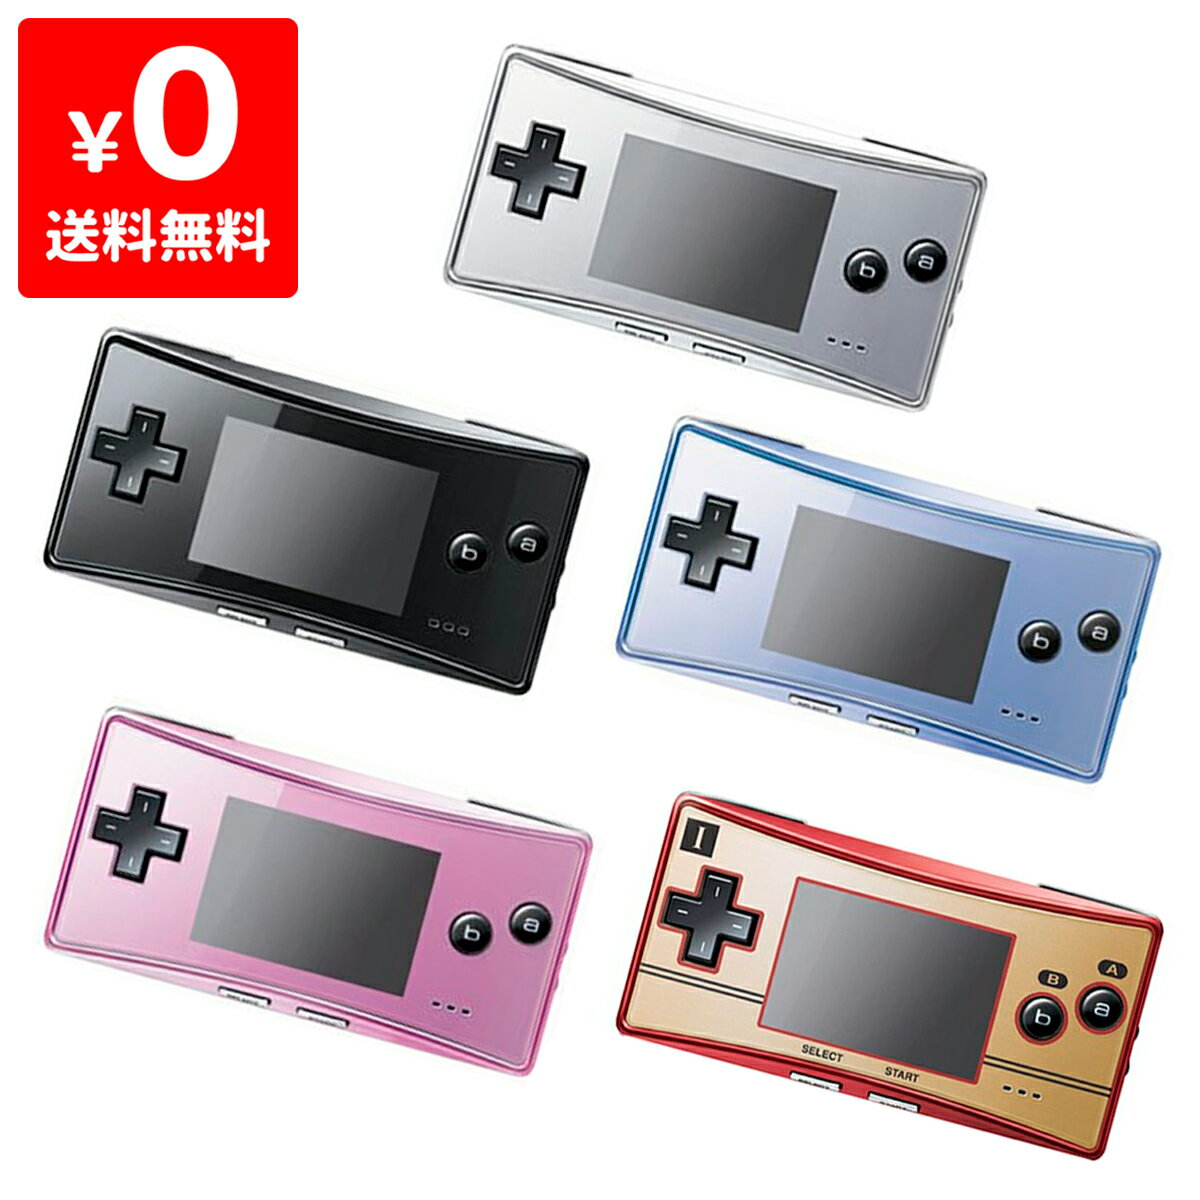 GBM ゲームボーイミクロ 本体 電池カバー付き 選べる5色 Nintendo 任天堂 ニンテンドー 【中古】 4902370512311 送料無料